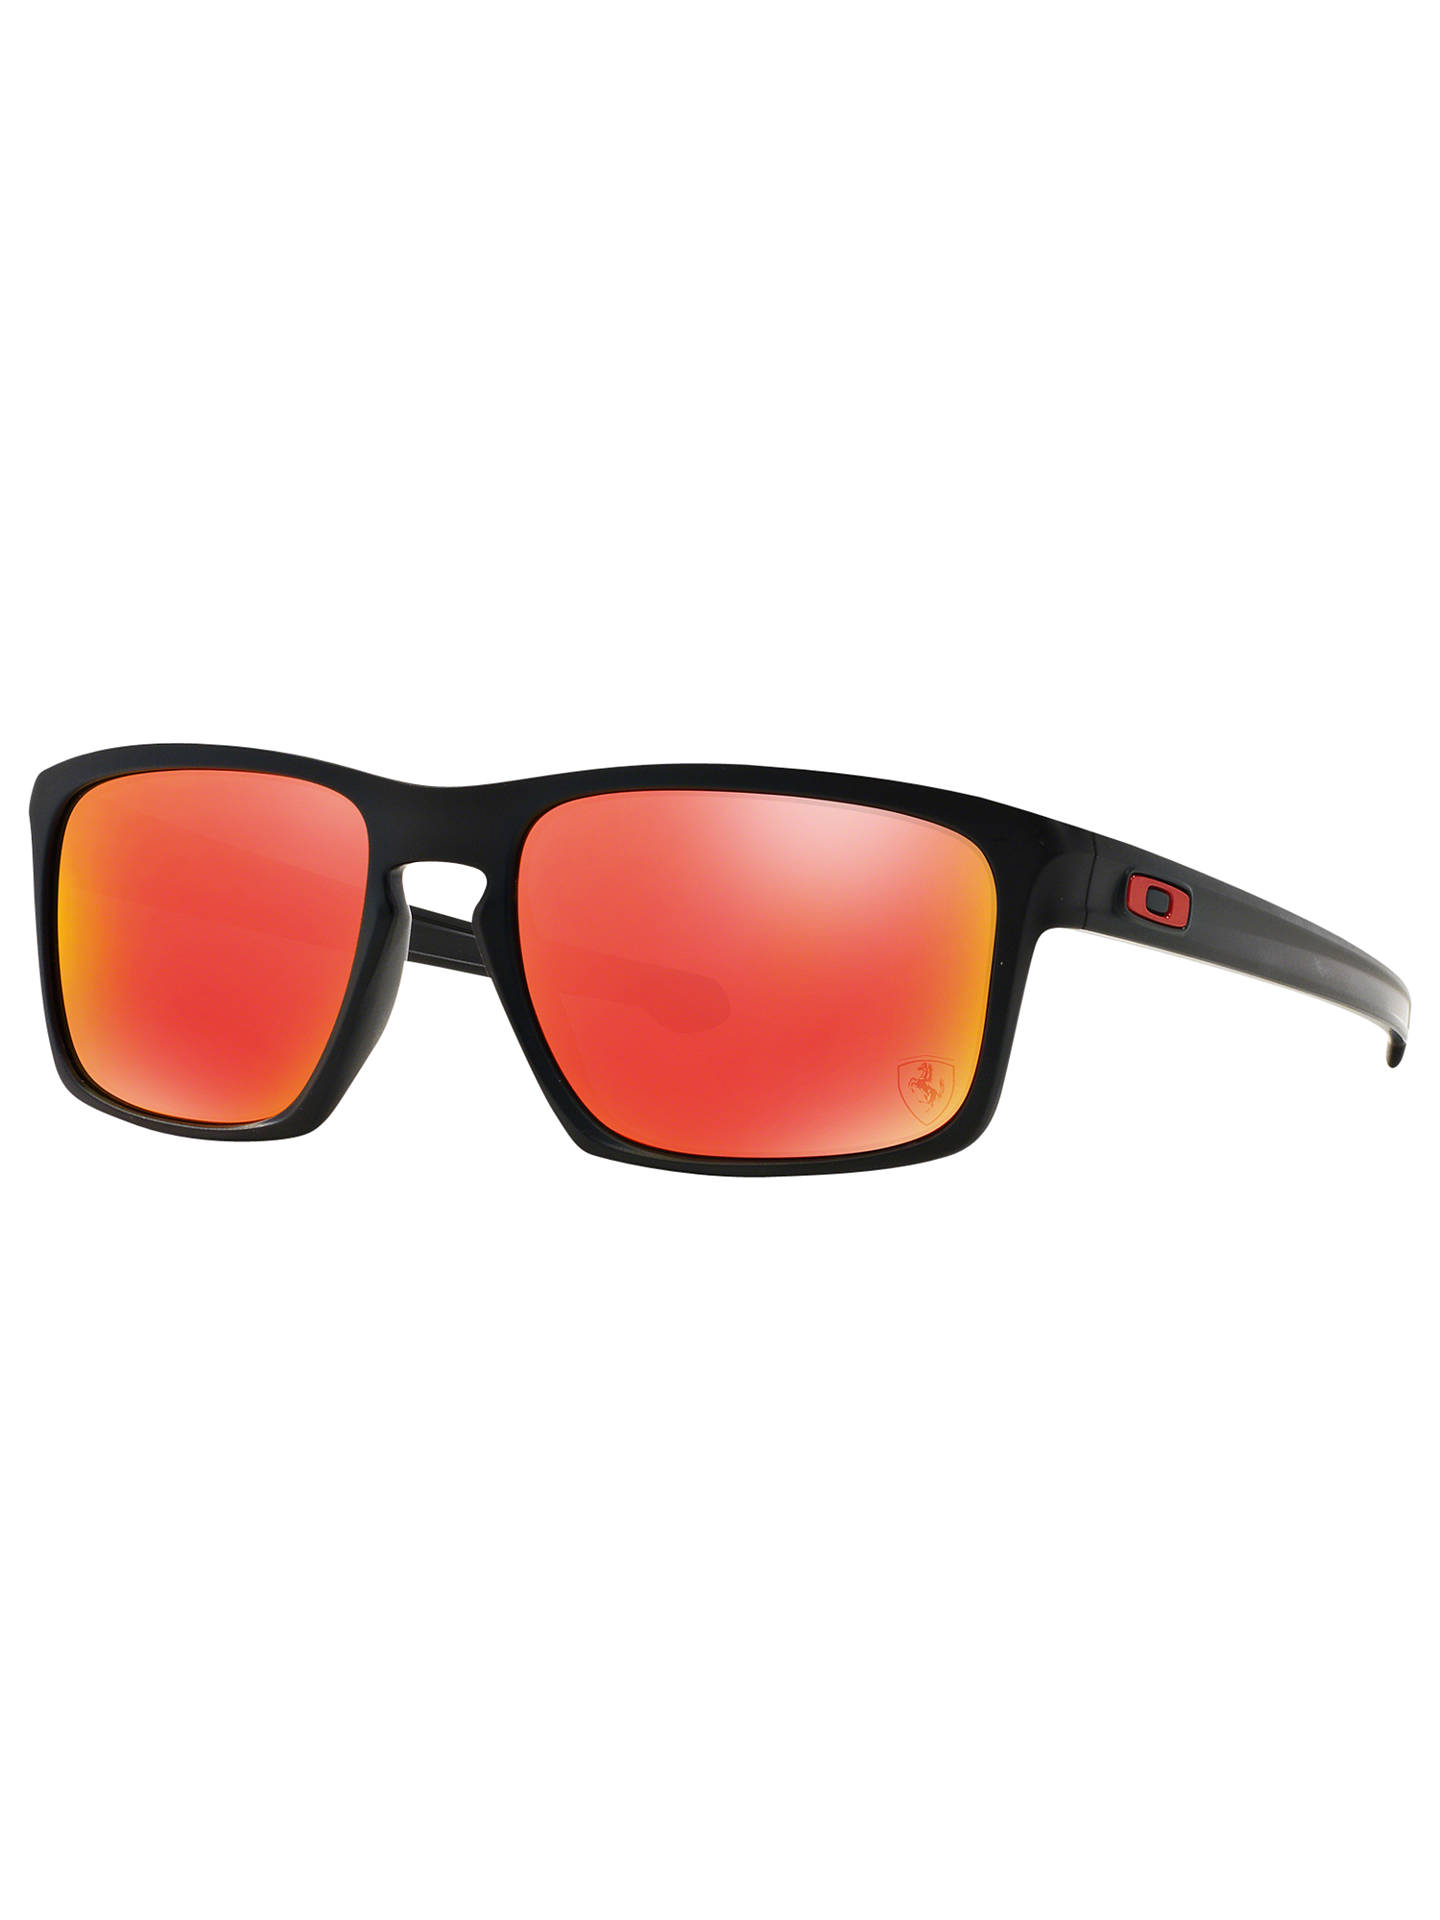 5a4dd0f5c1c BuyOakley OO9262 Sliver Scuderia Ferrari Collection Rectangular Sunglasses